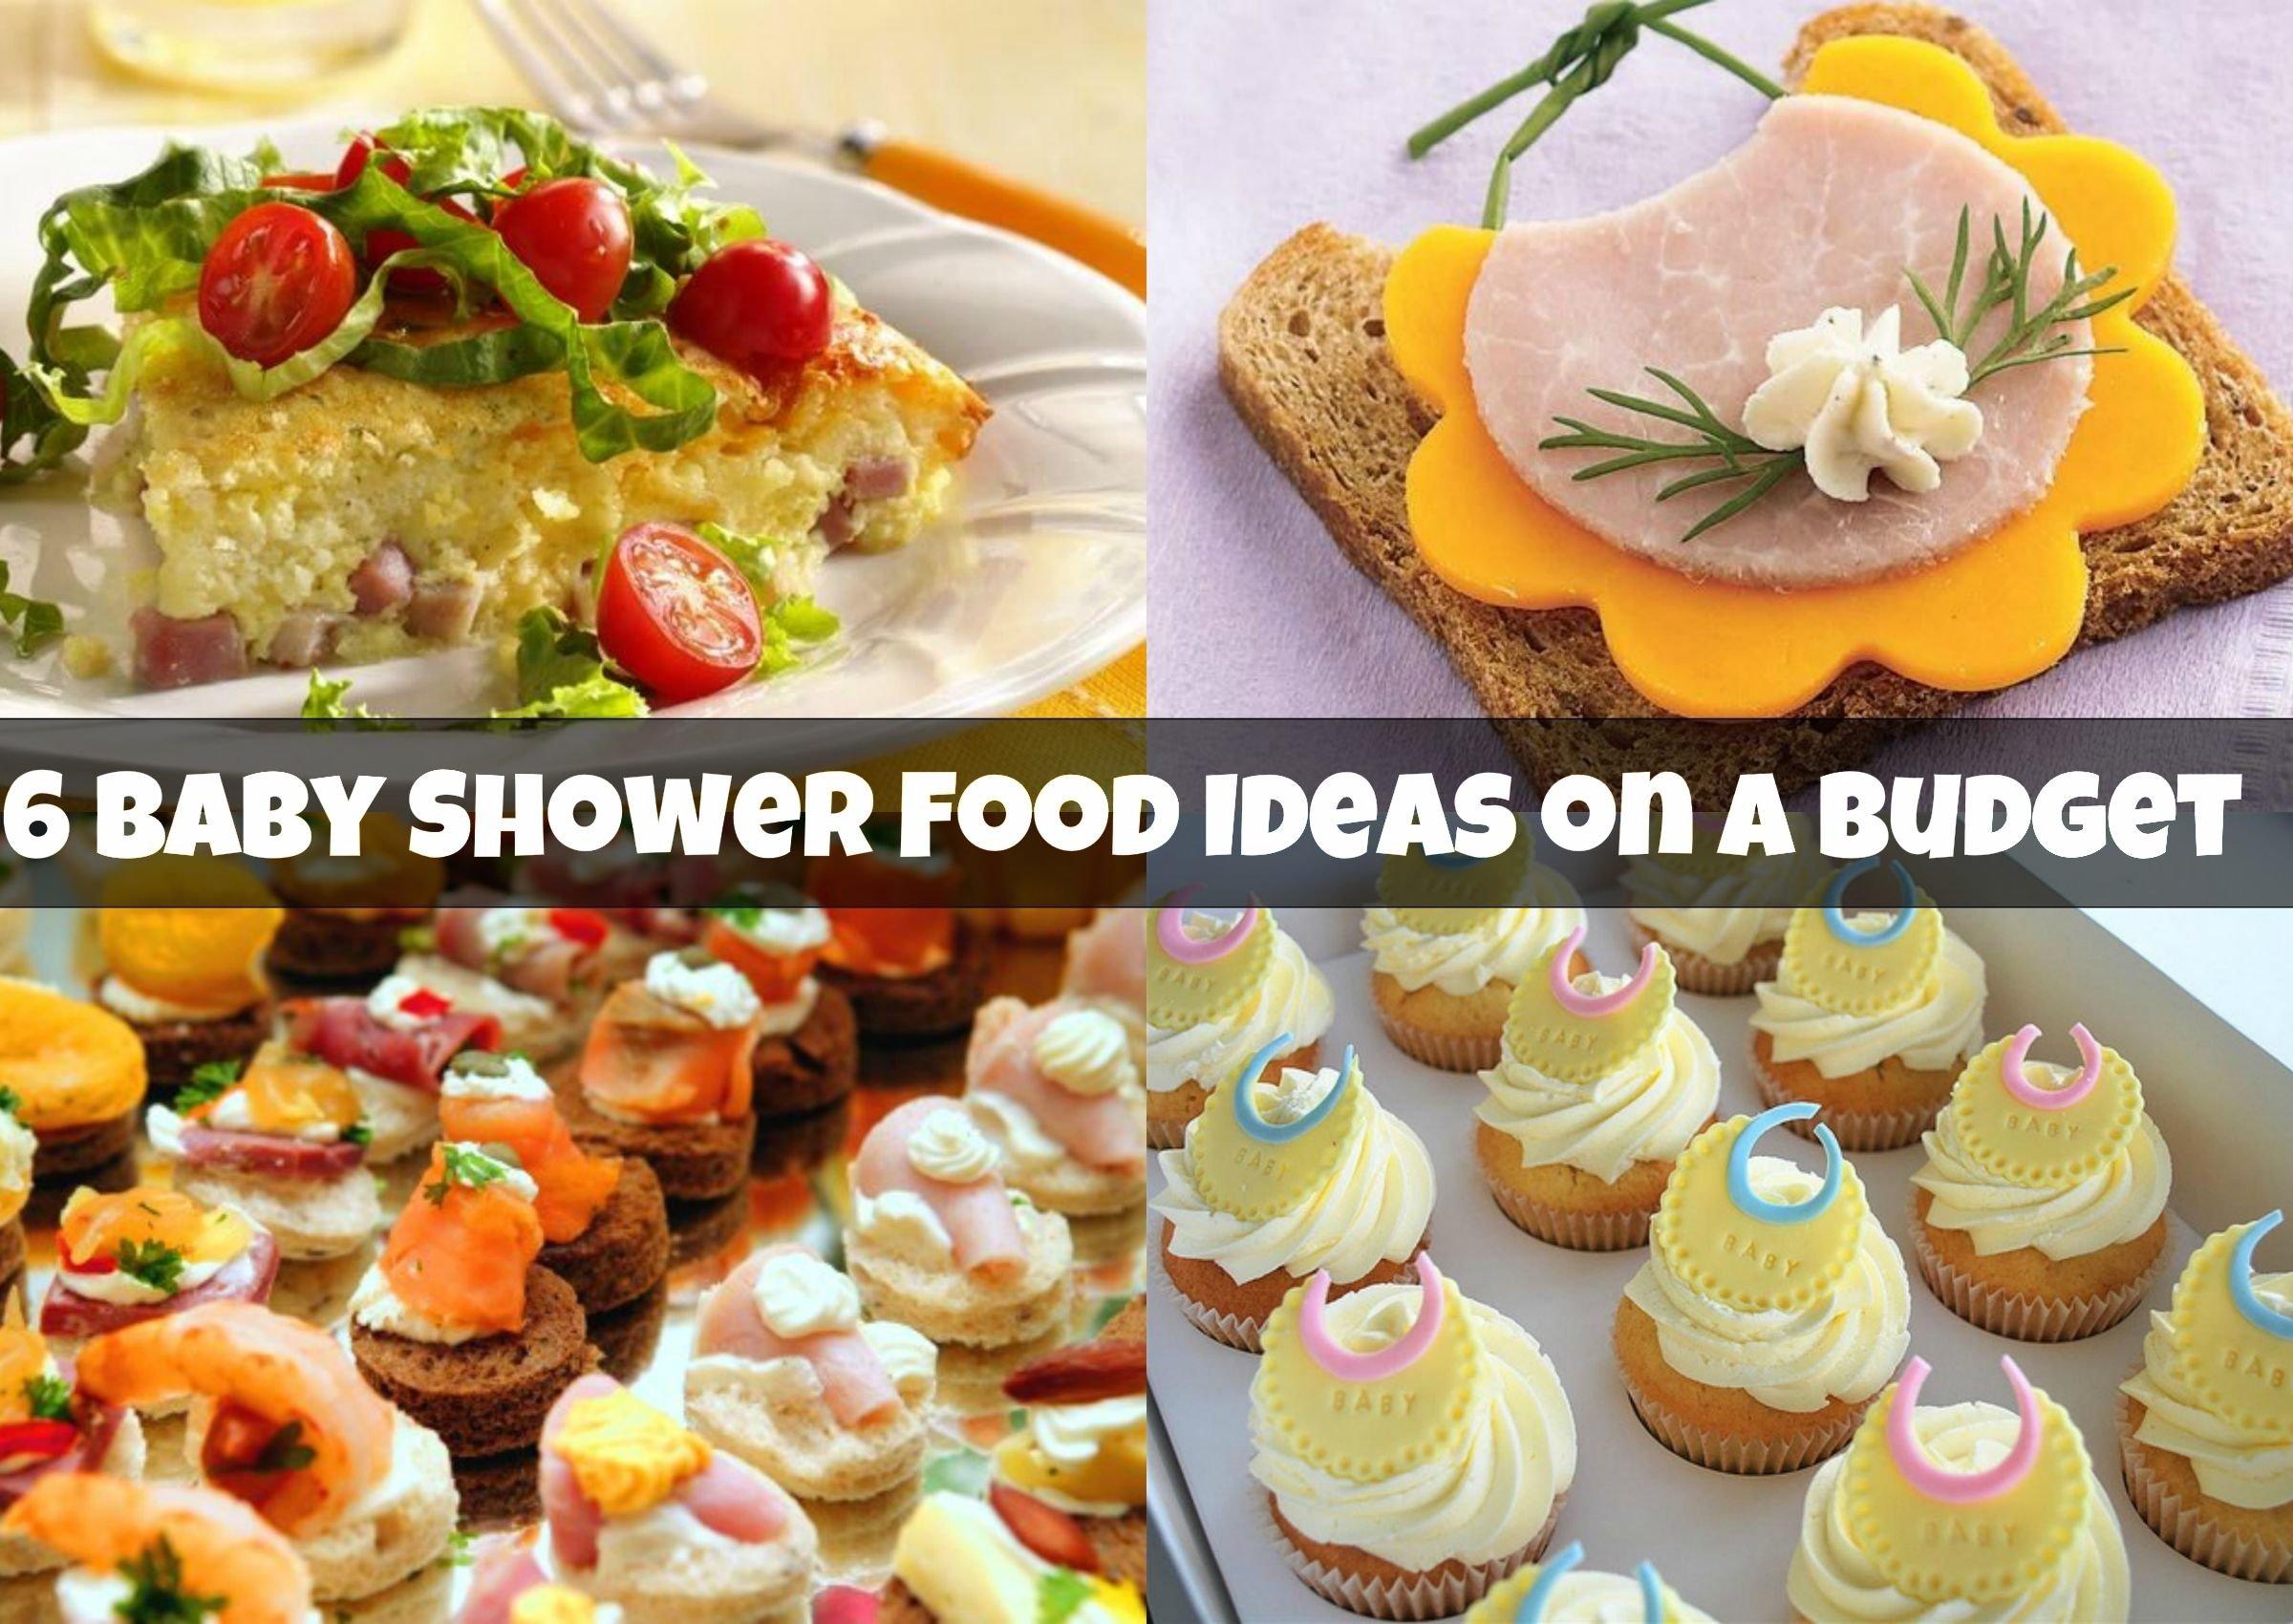 10 Perfect Menu Ideas For Baby Shower singular baby shower dinner ideas menu finger foods australian for 2 2020